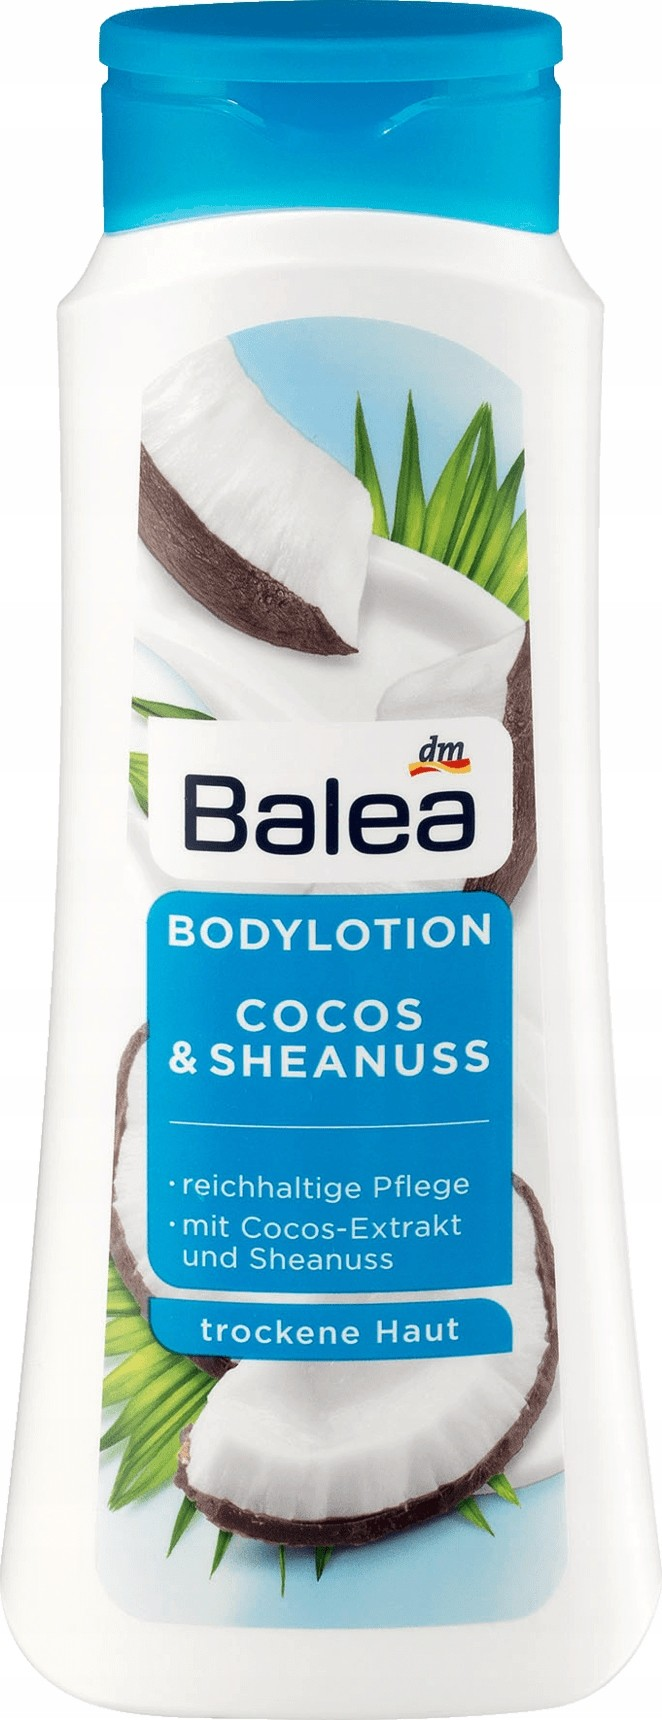 Balea Balsam z Kokosem i Masłem Shea 400 ml